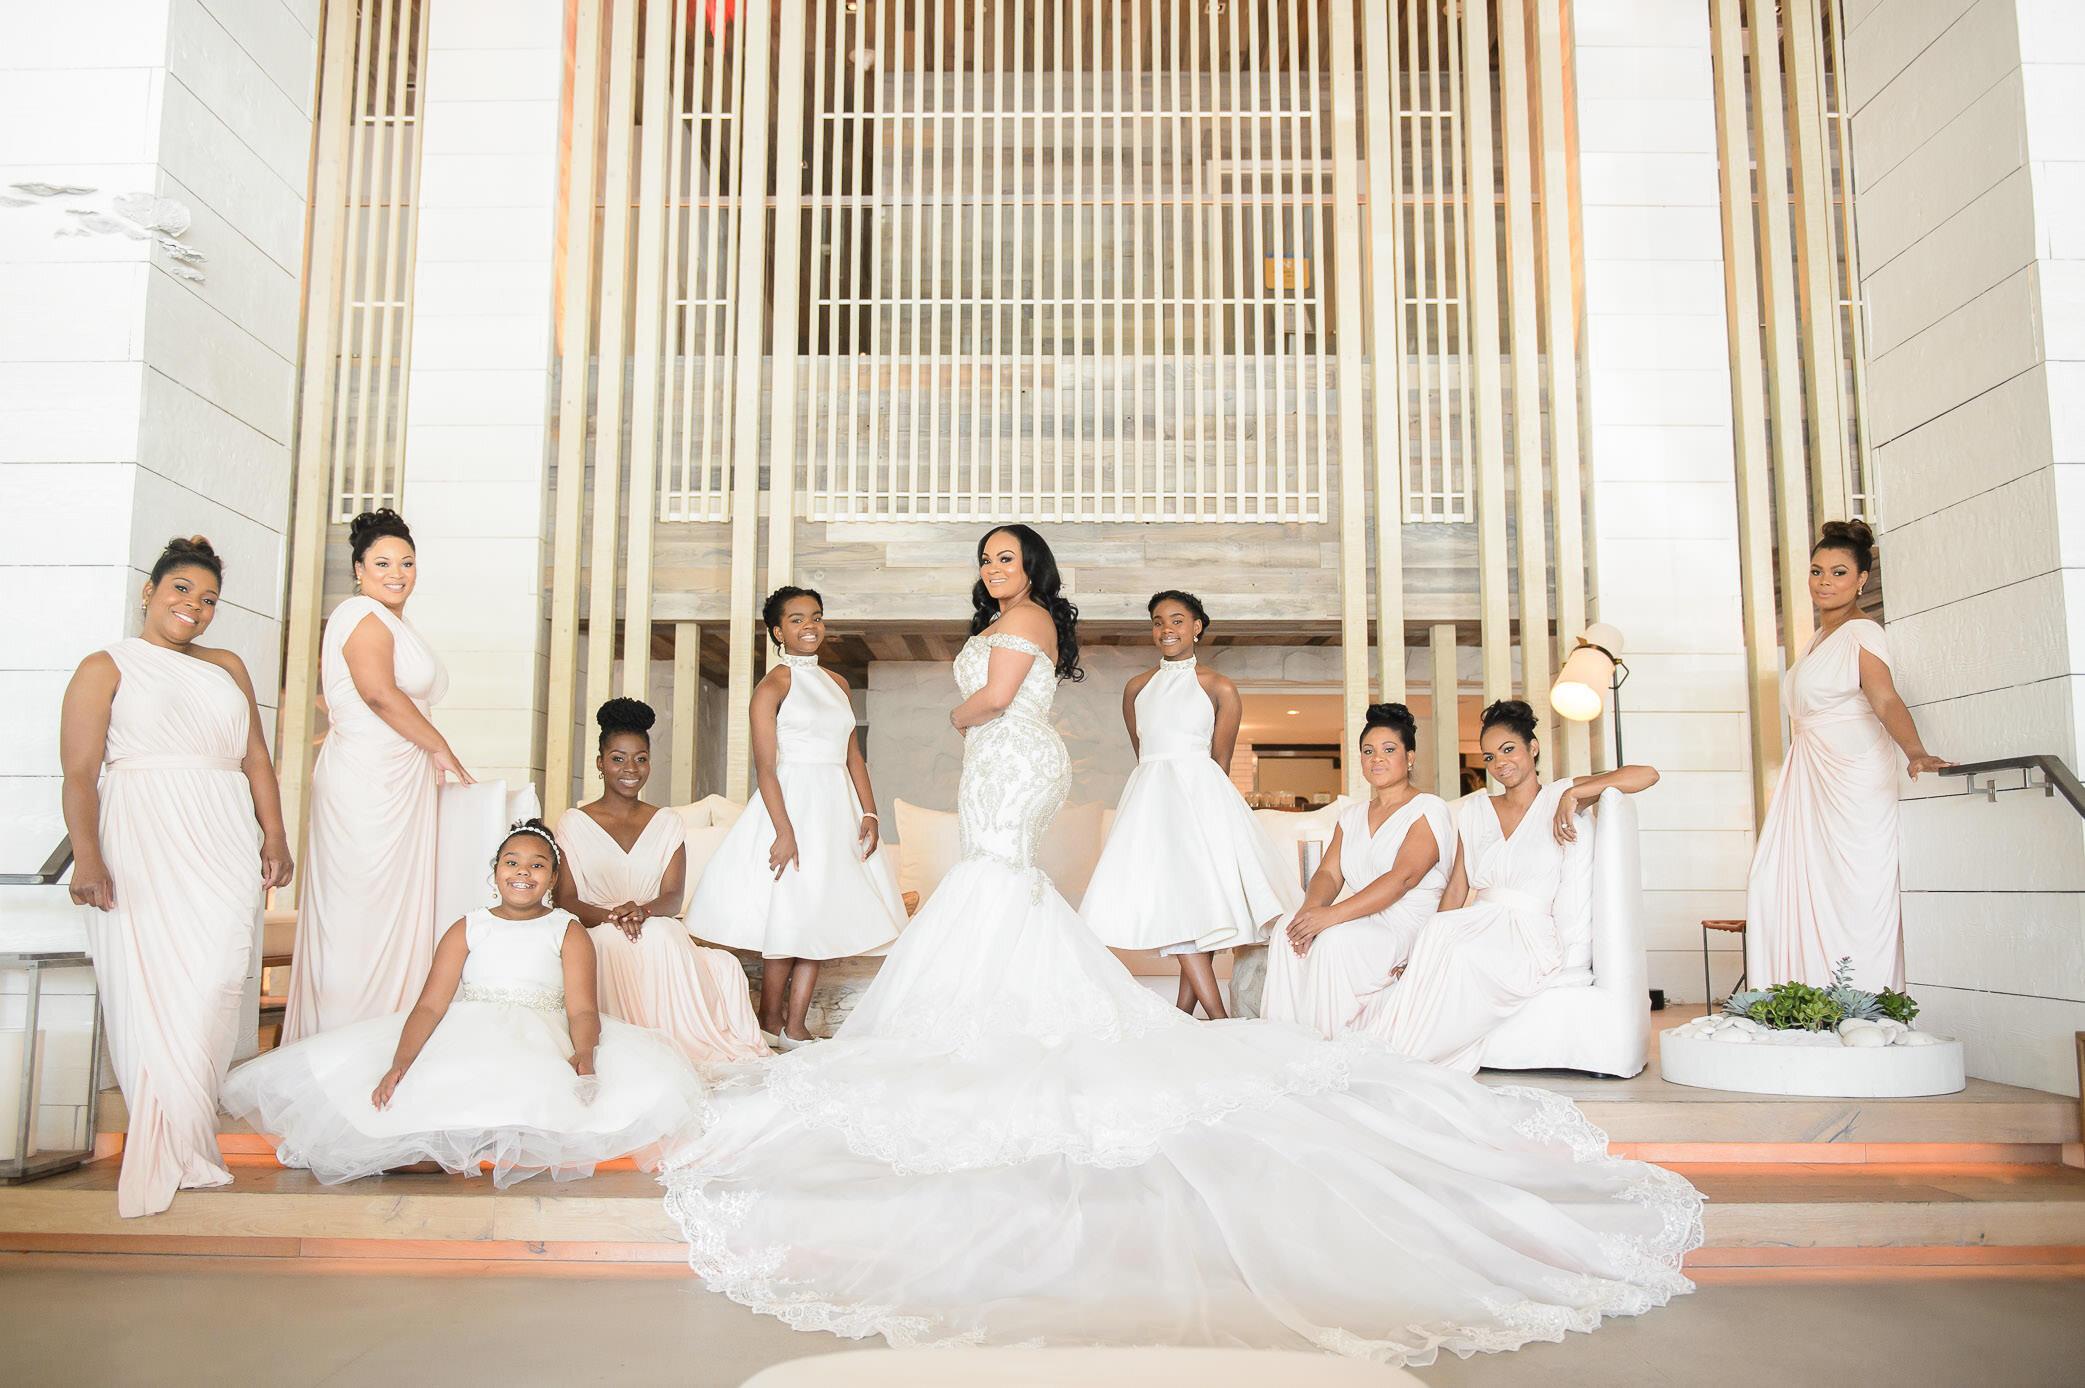 http://inije.com/paula-tricien-miami-wedding/